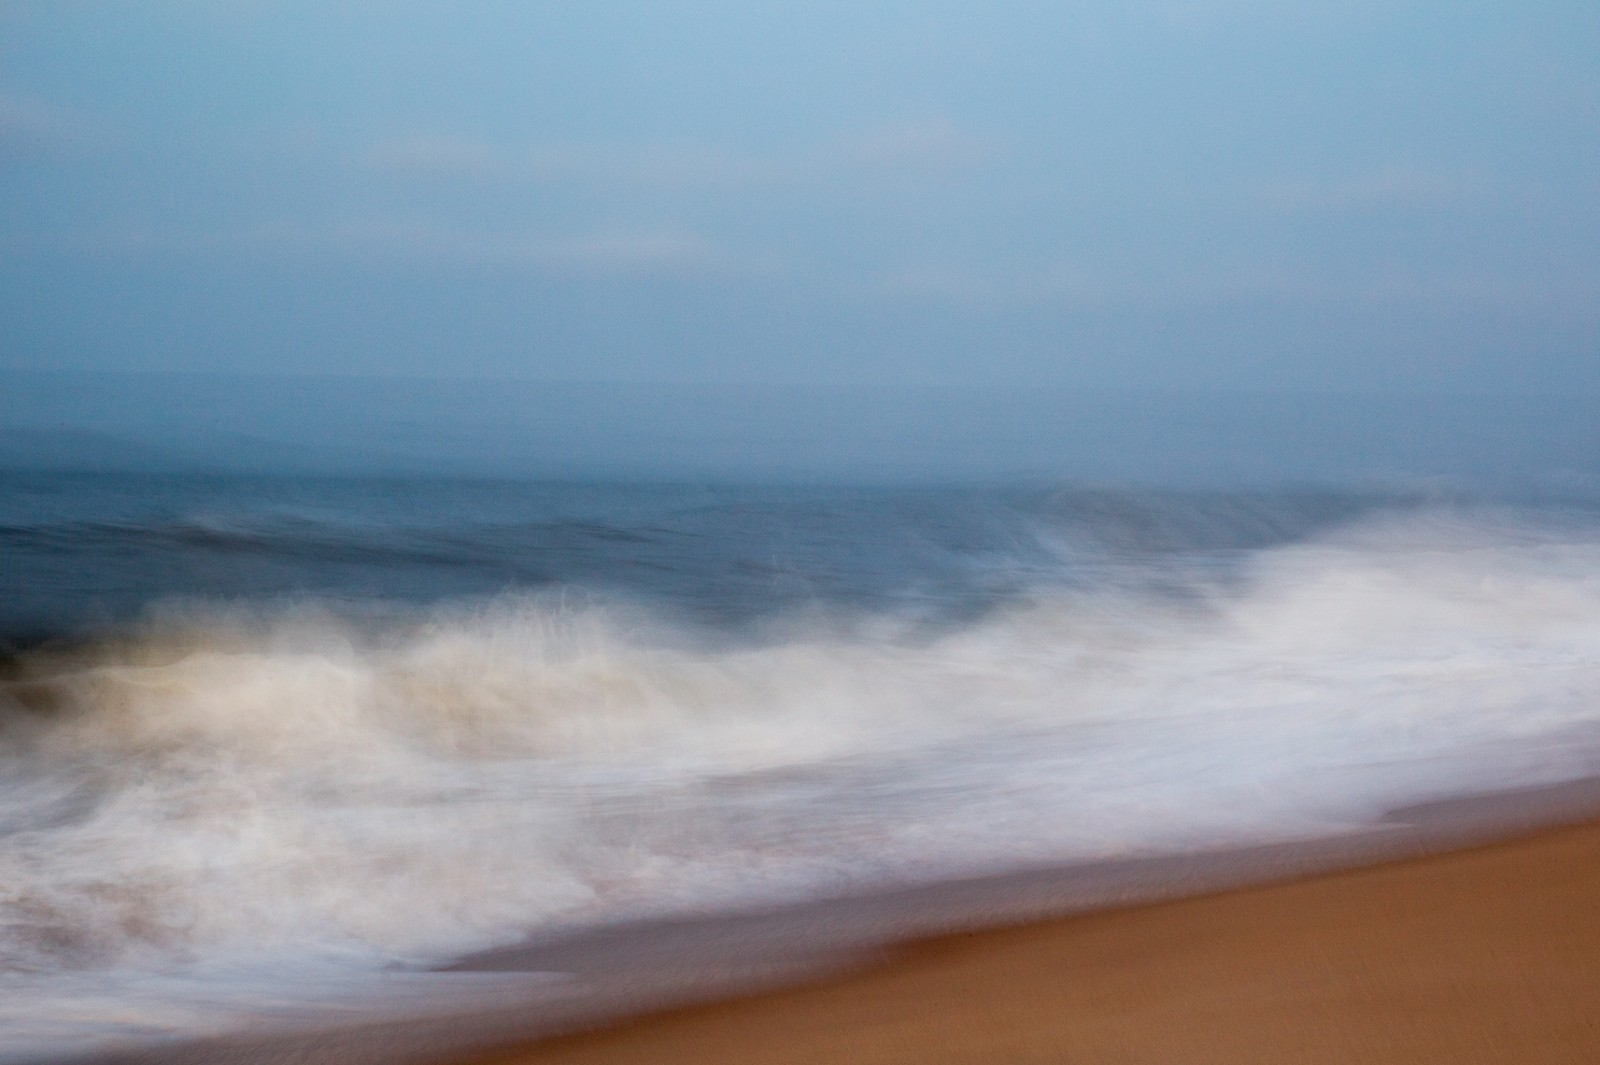 Morning Waves 25x30